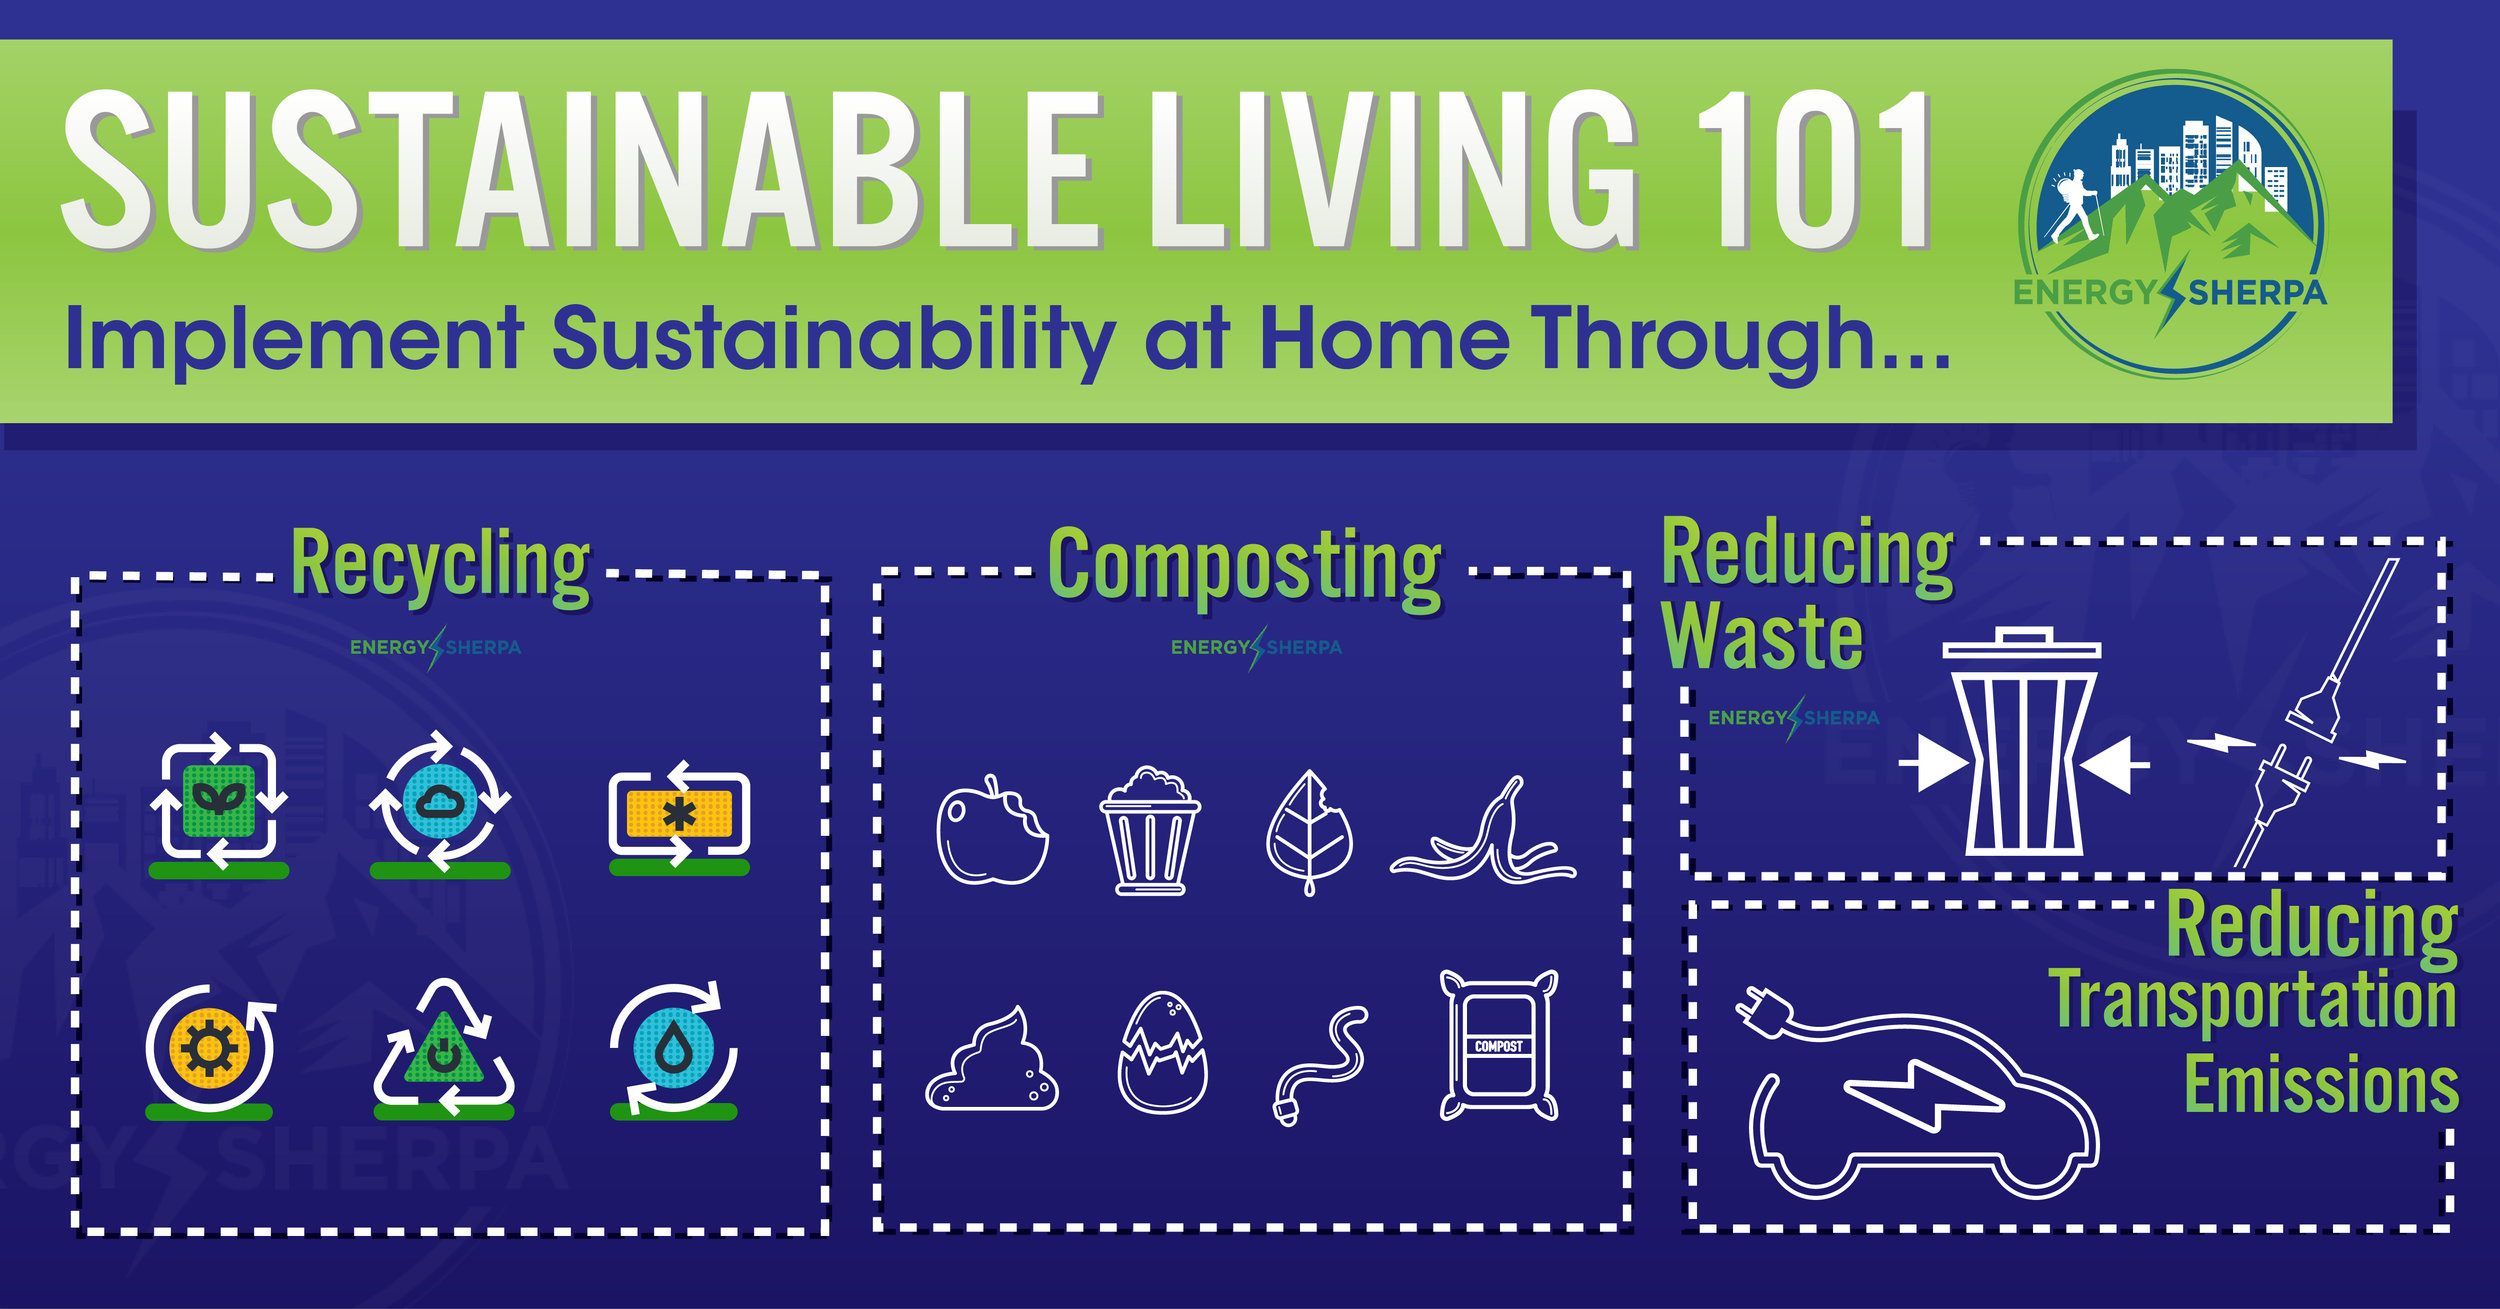 Sustainable_Living_101-01.jpg